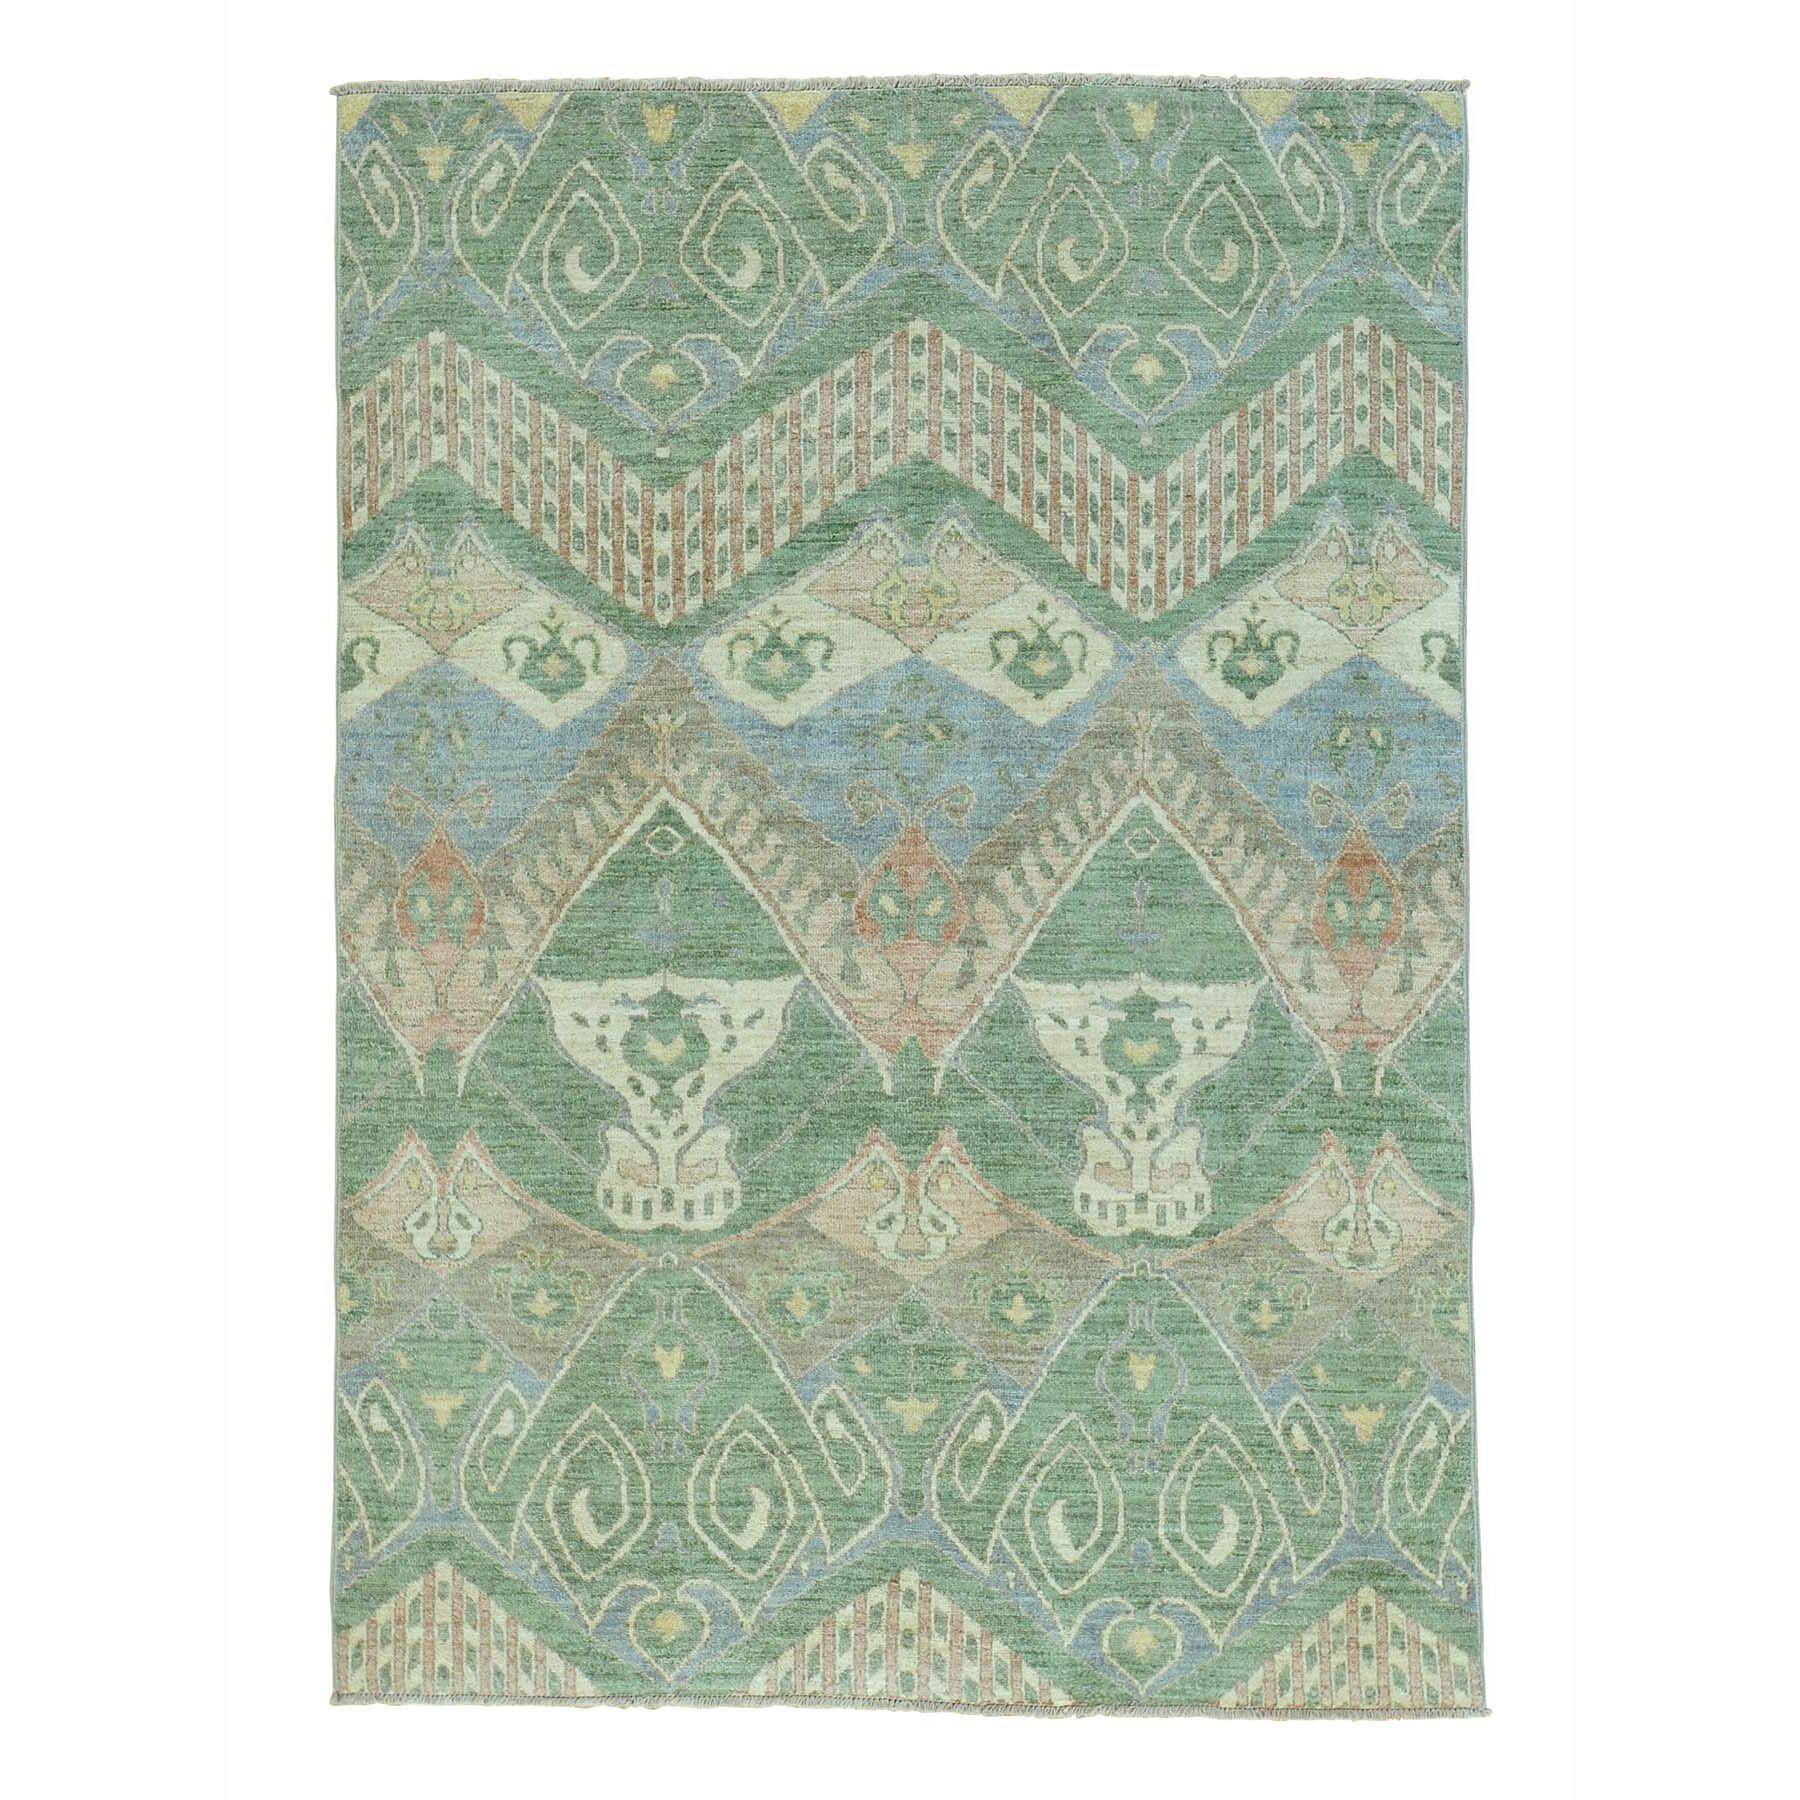 One-of-a-Kind Gillum Ikat Uzbek Oriental Hand-Knotted Green/Beige Area Rug